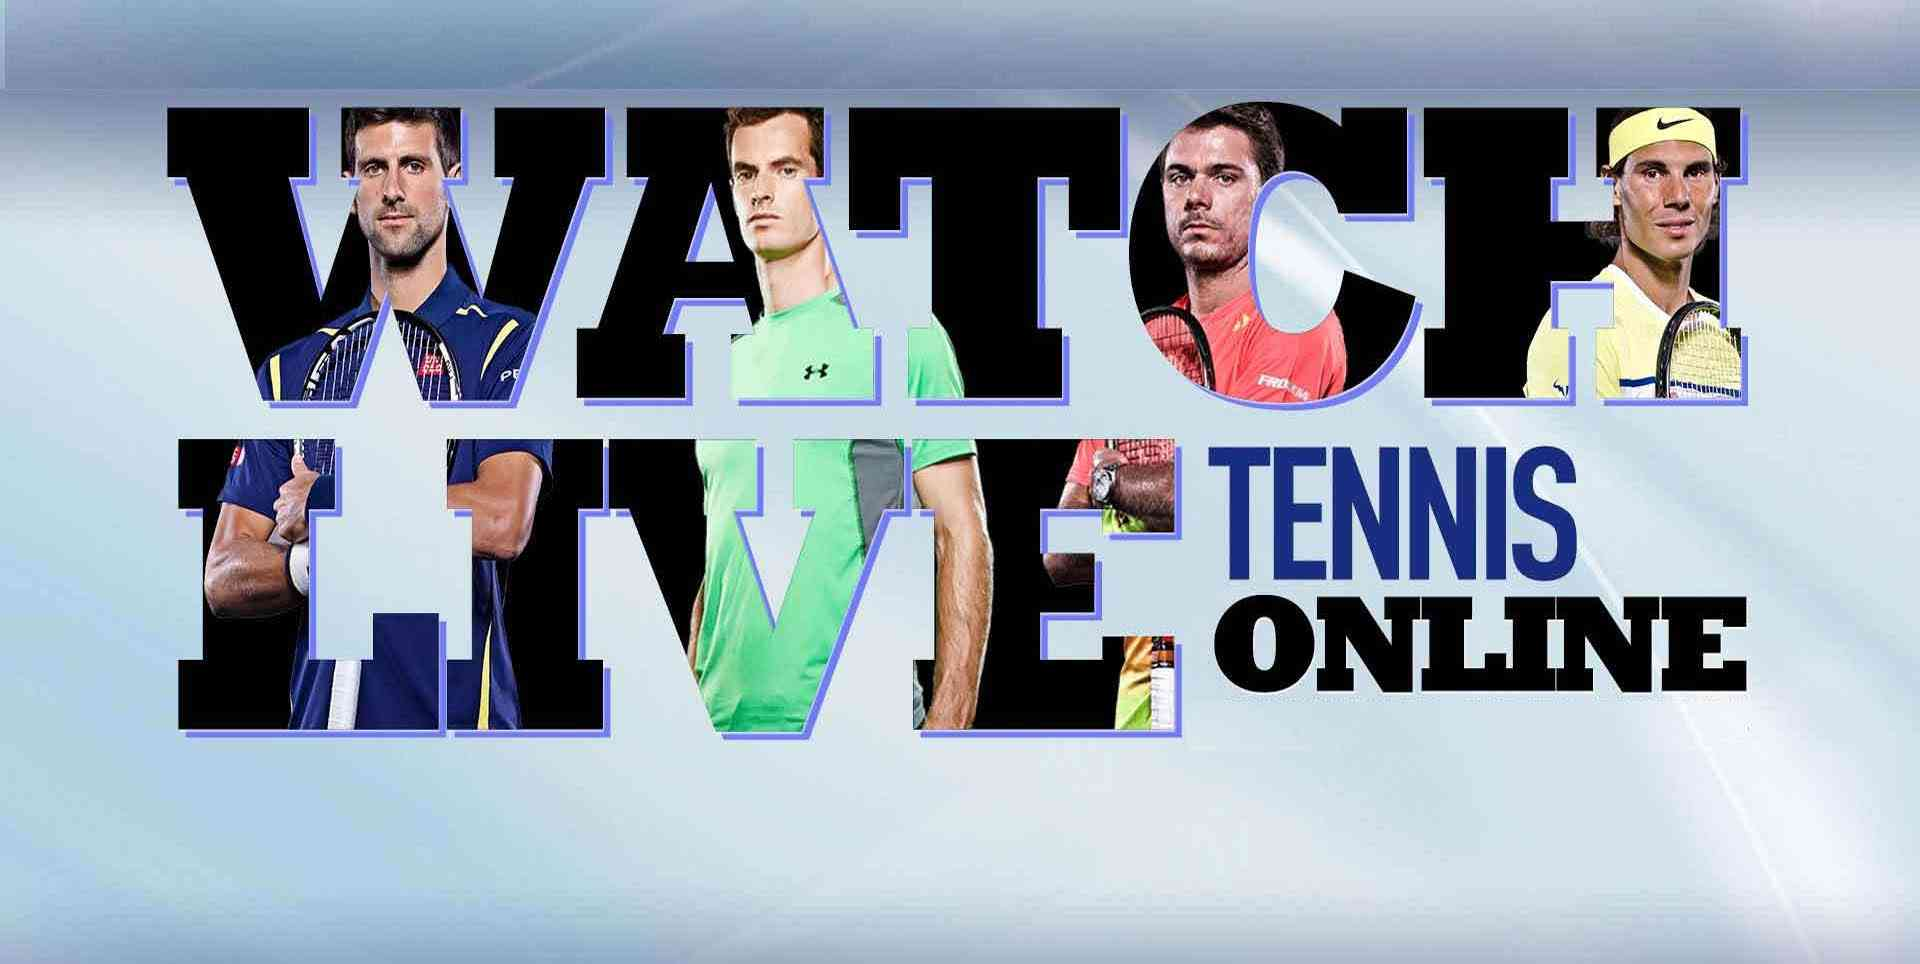 Watch E. Makarova vs M. Niculescu Quarterfinals Online 2013